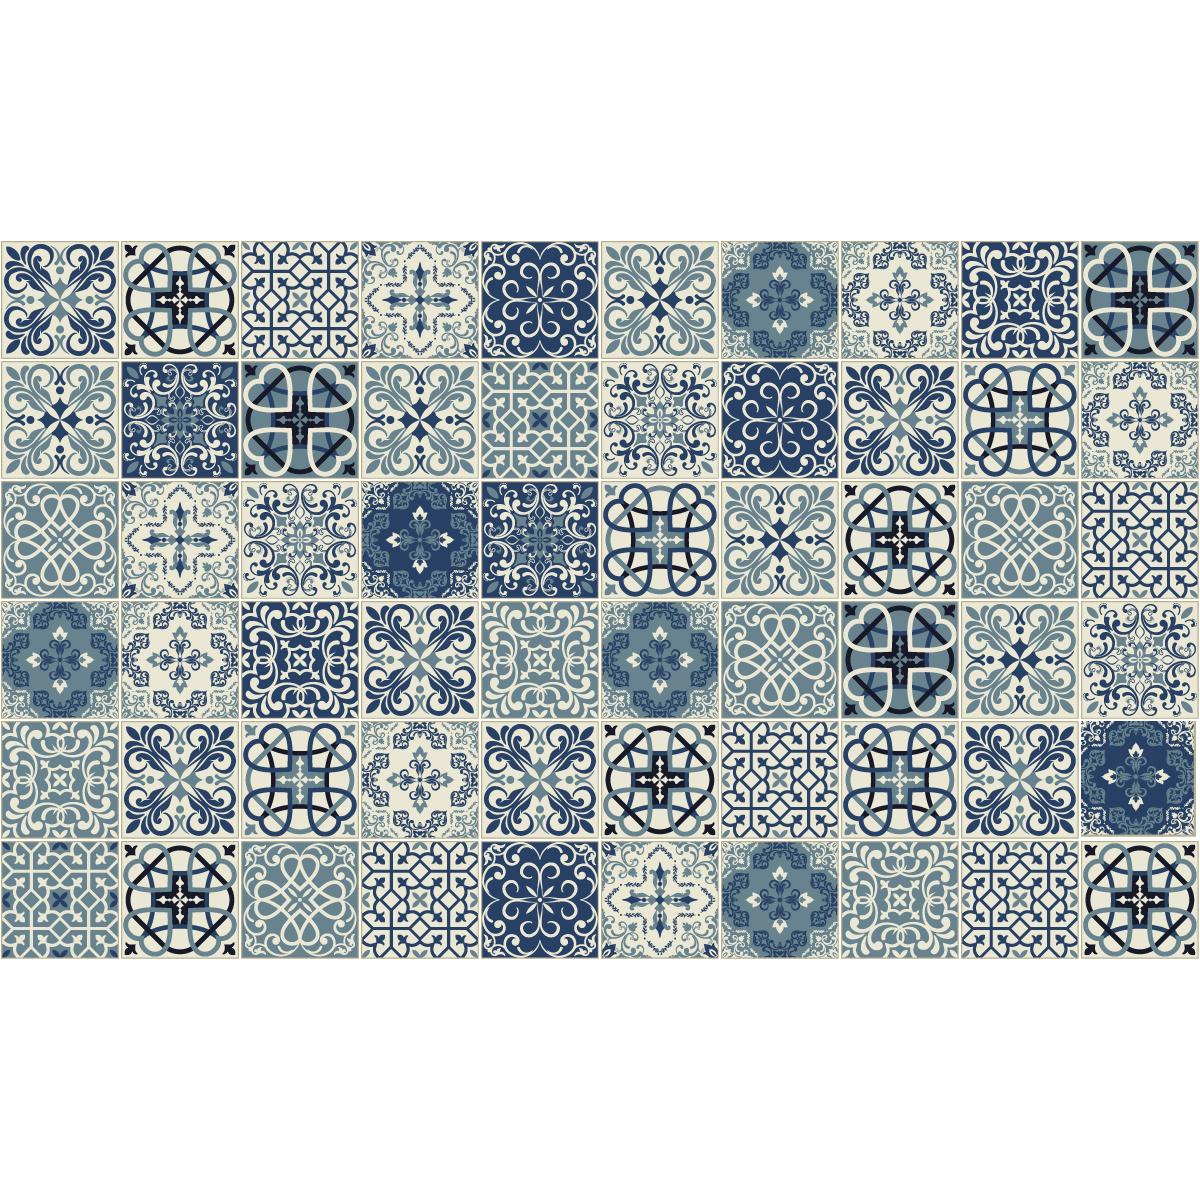 60 stickers carreaux de ciment azulejos gerardo salle de. Black Bedroom Furniture Sets. Home Design Ideas